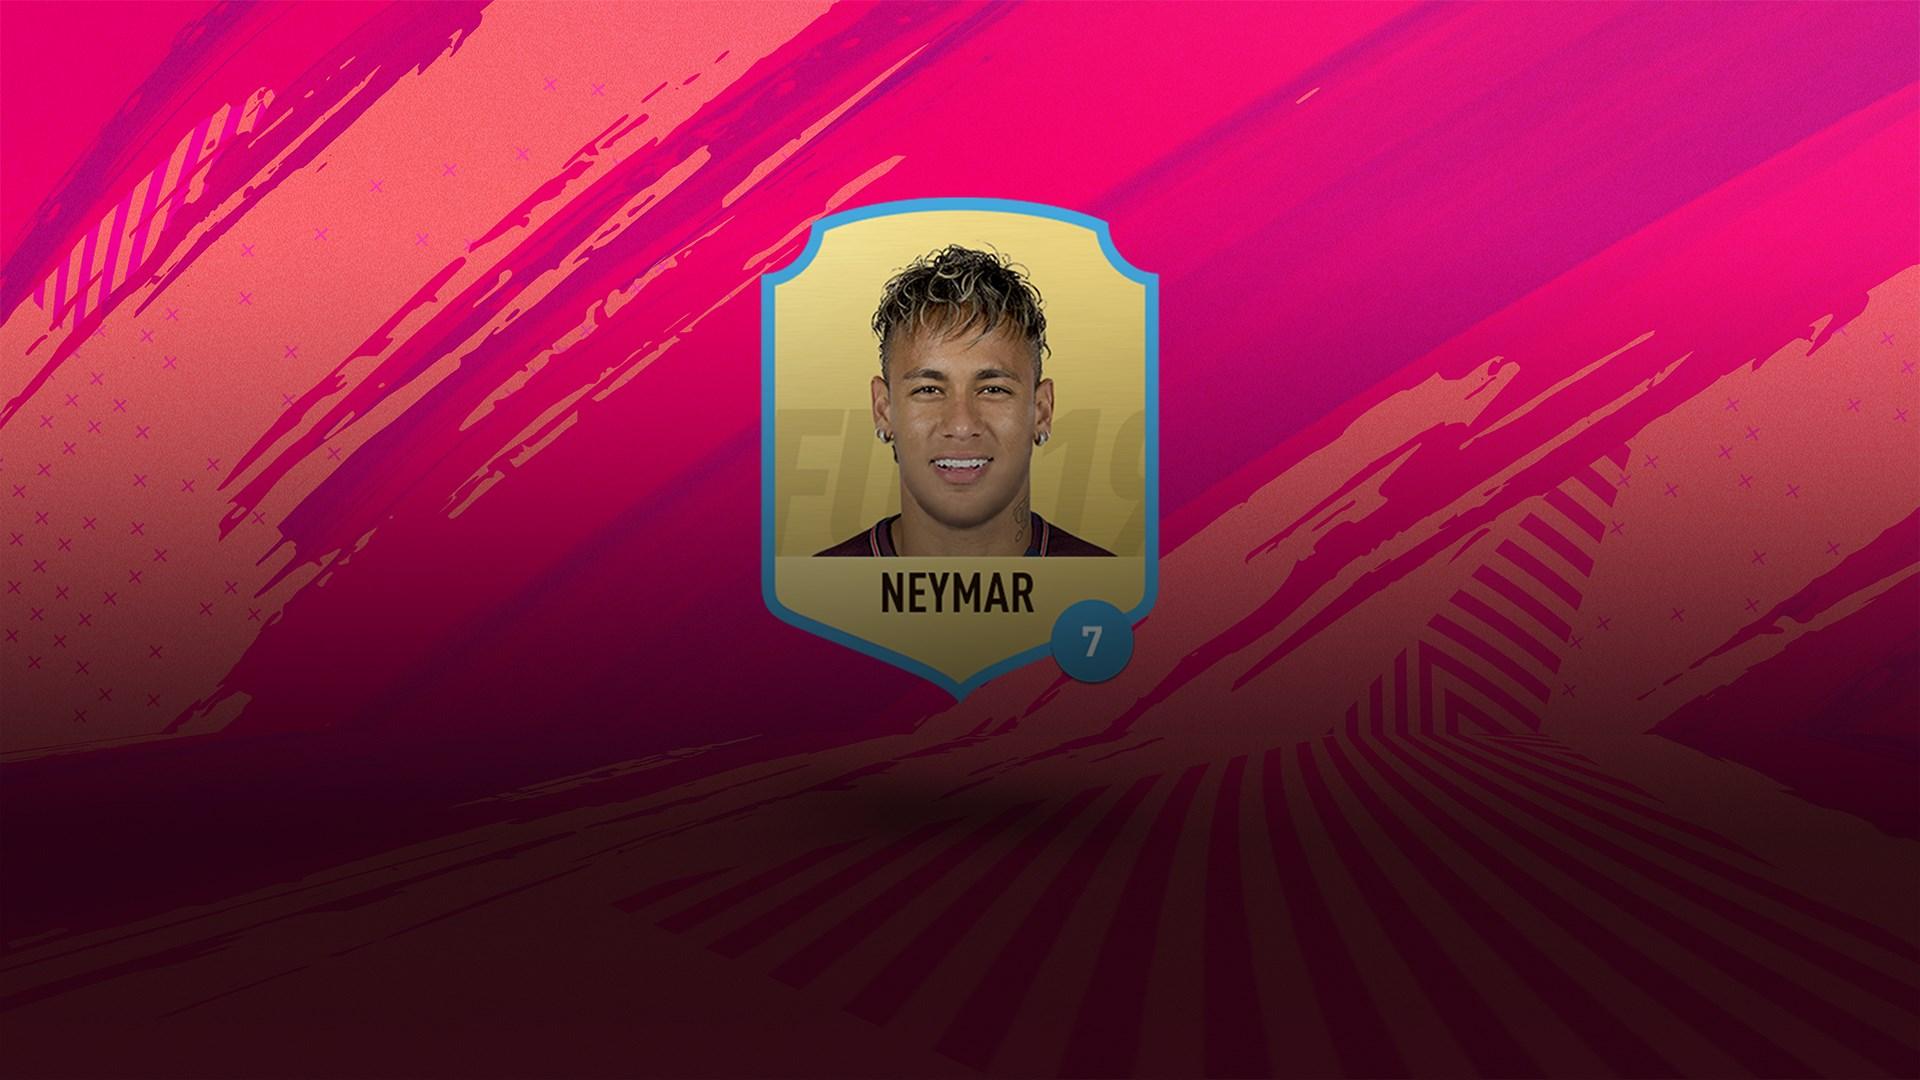 Neymar Jr Loan Player